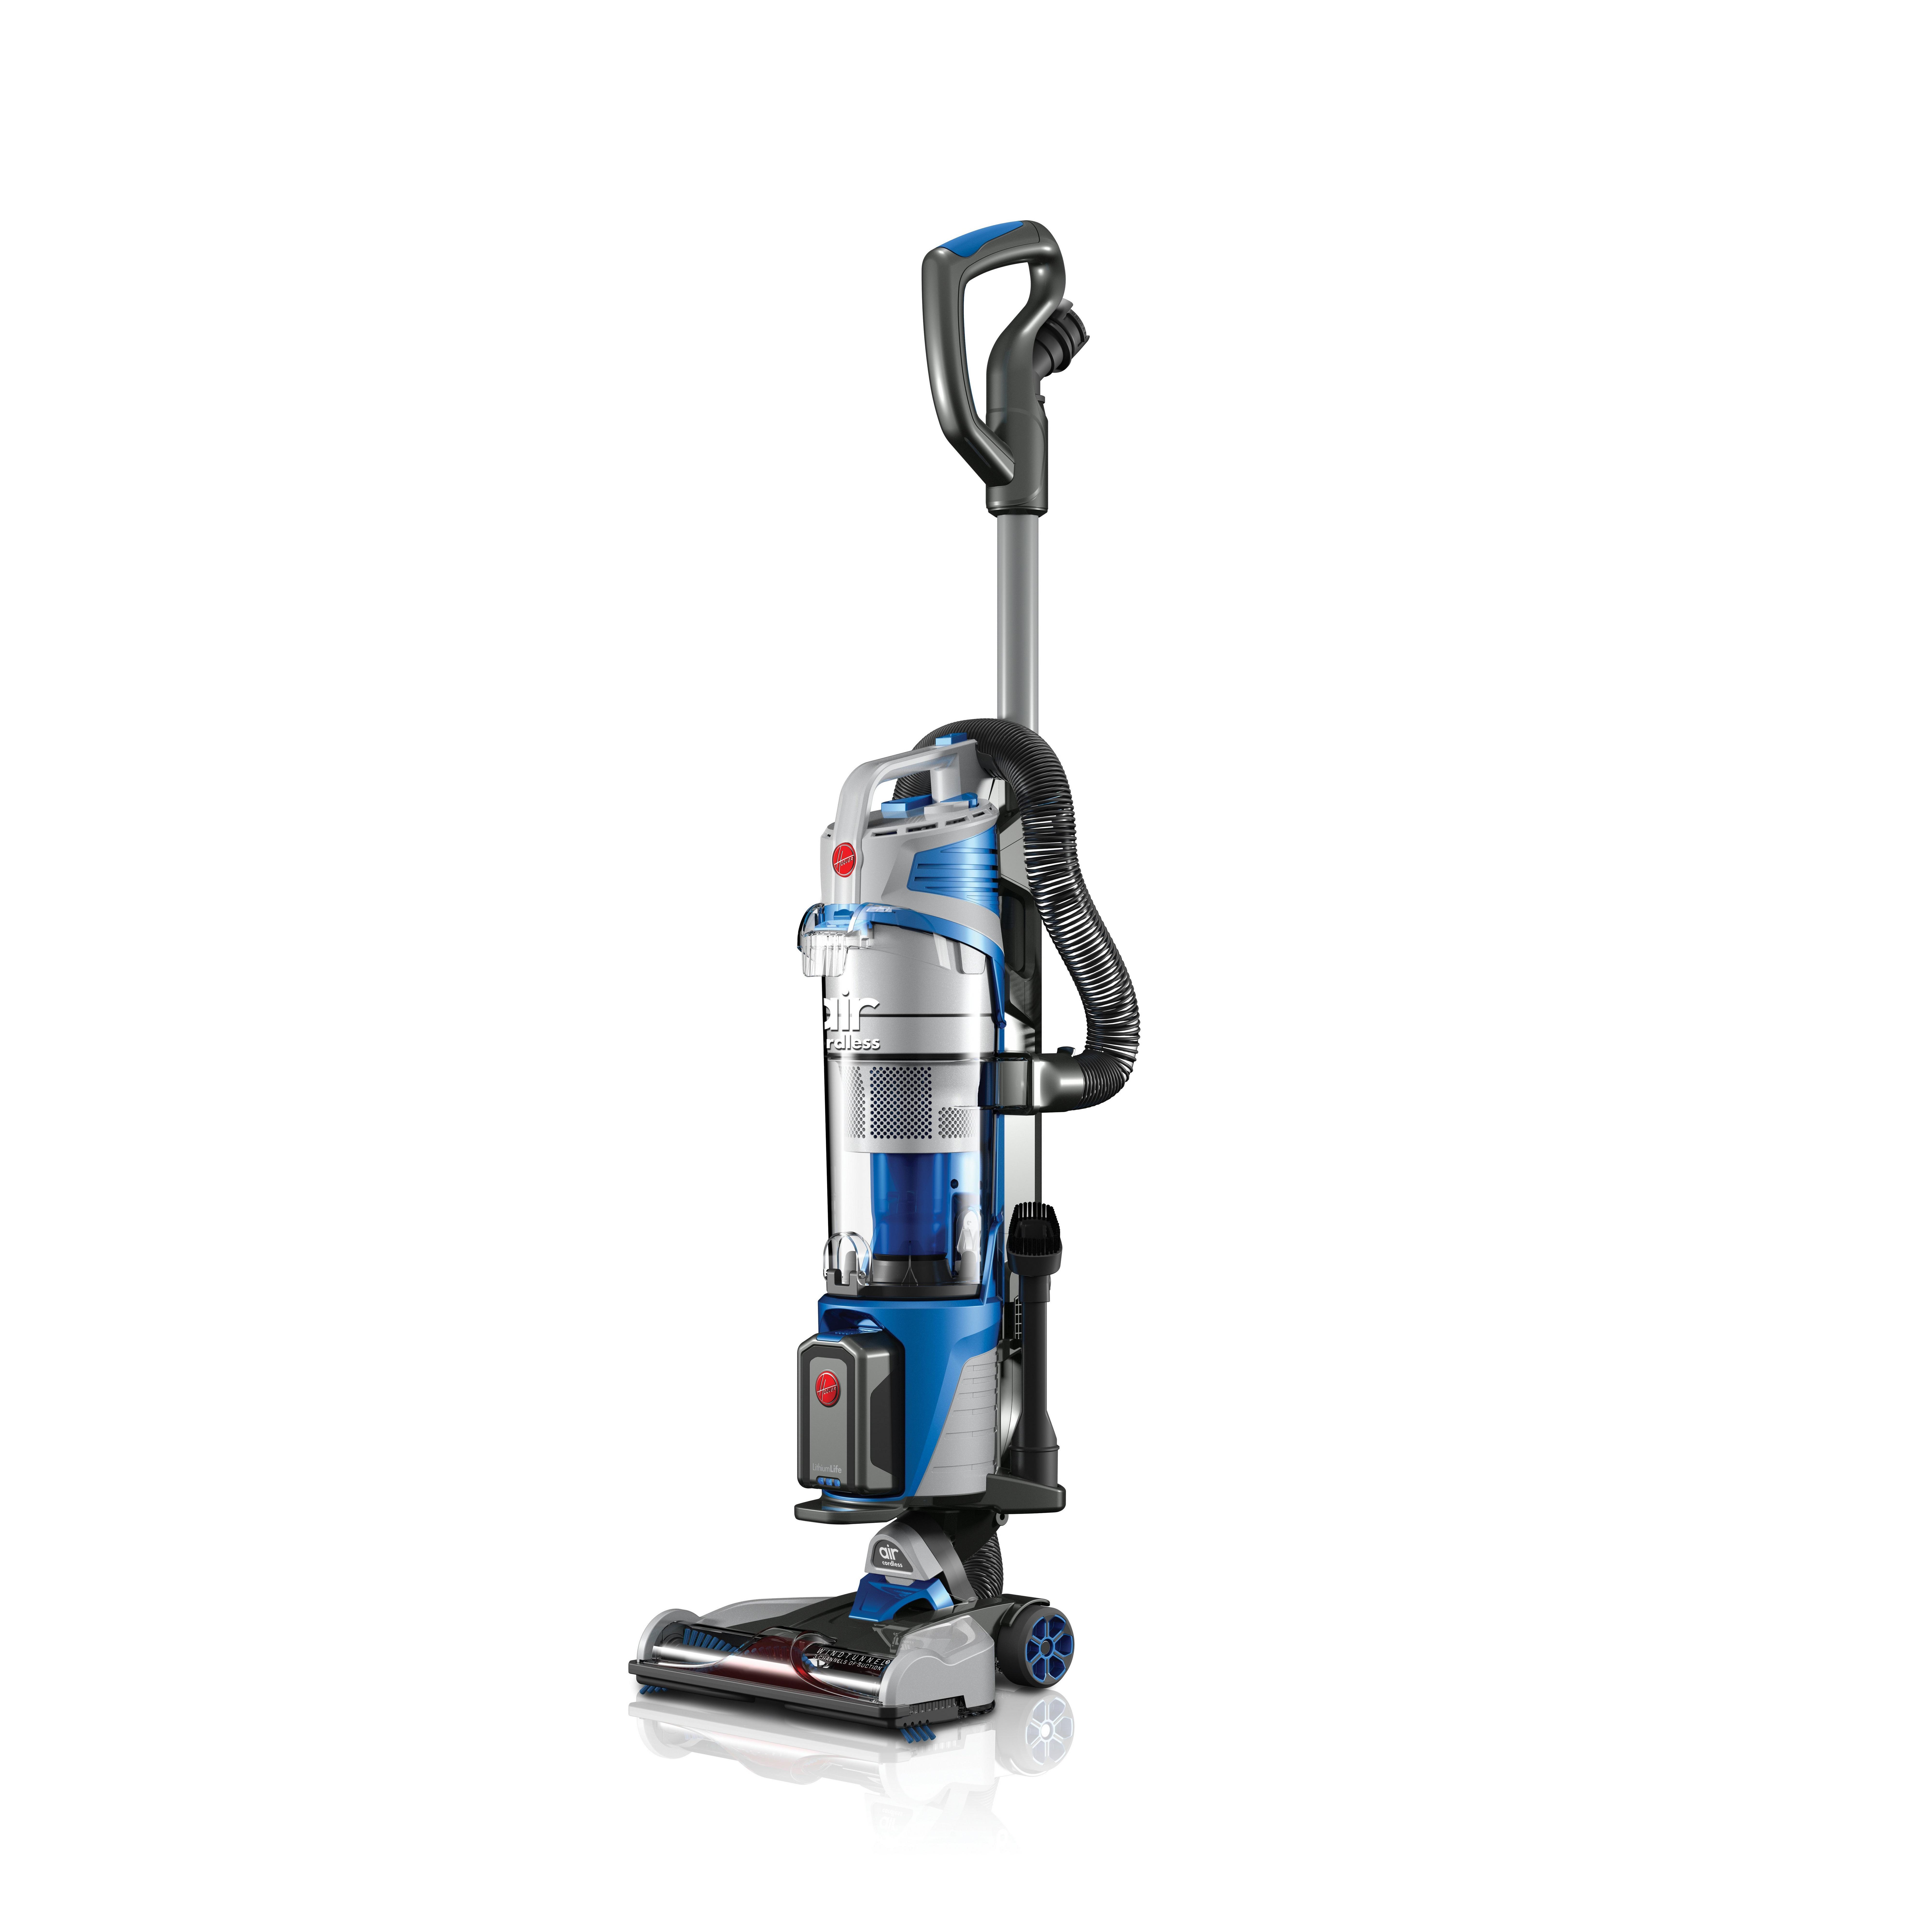 Air Cordless Lift Upright Vacuum2